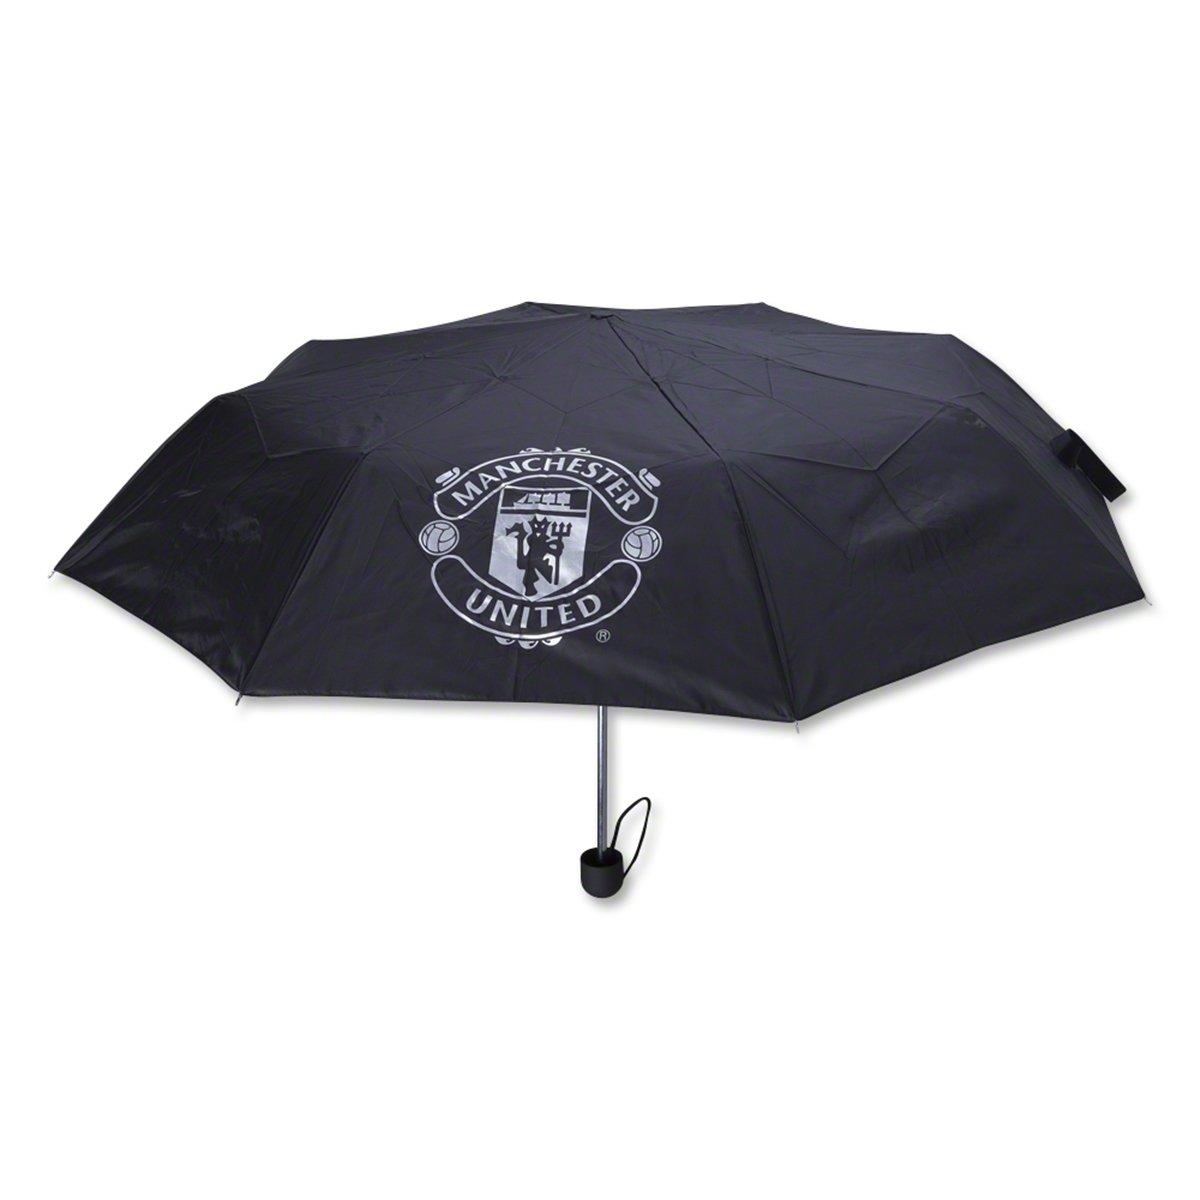 Manchester United Telescopic Compact Umbrella in Pouch